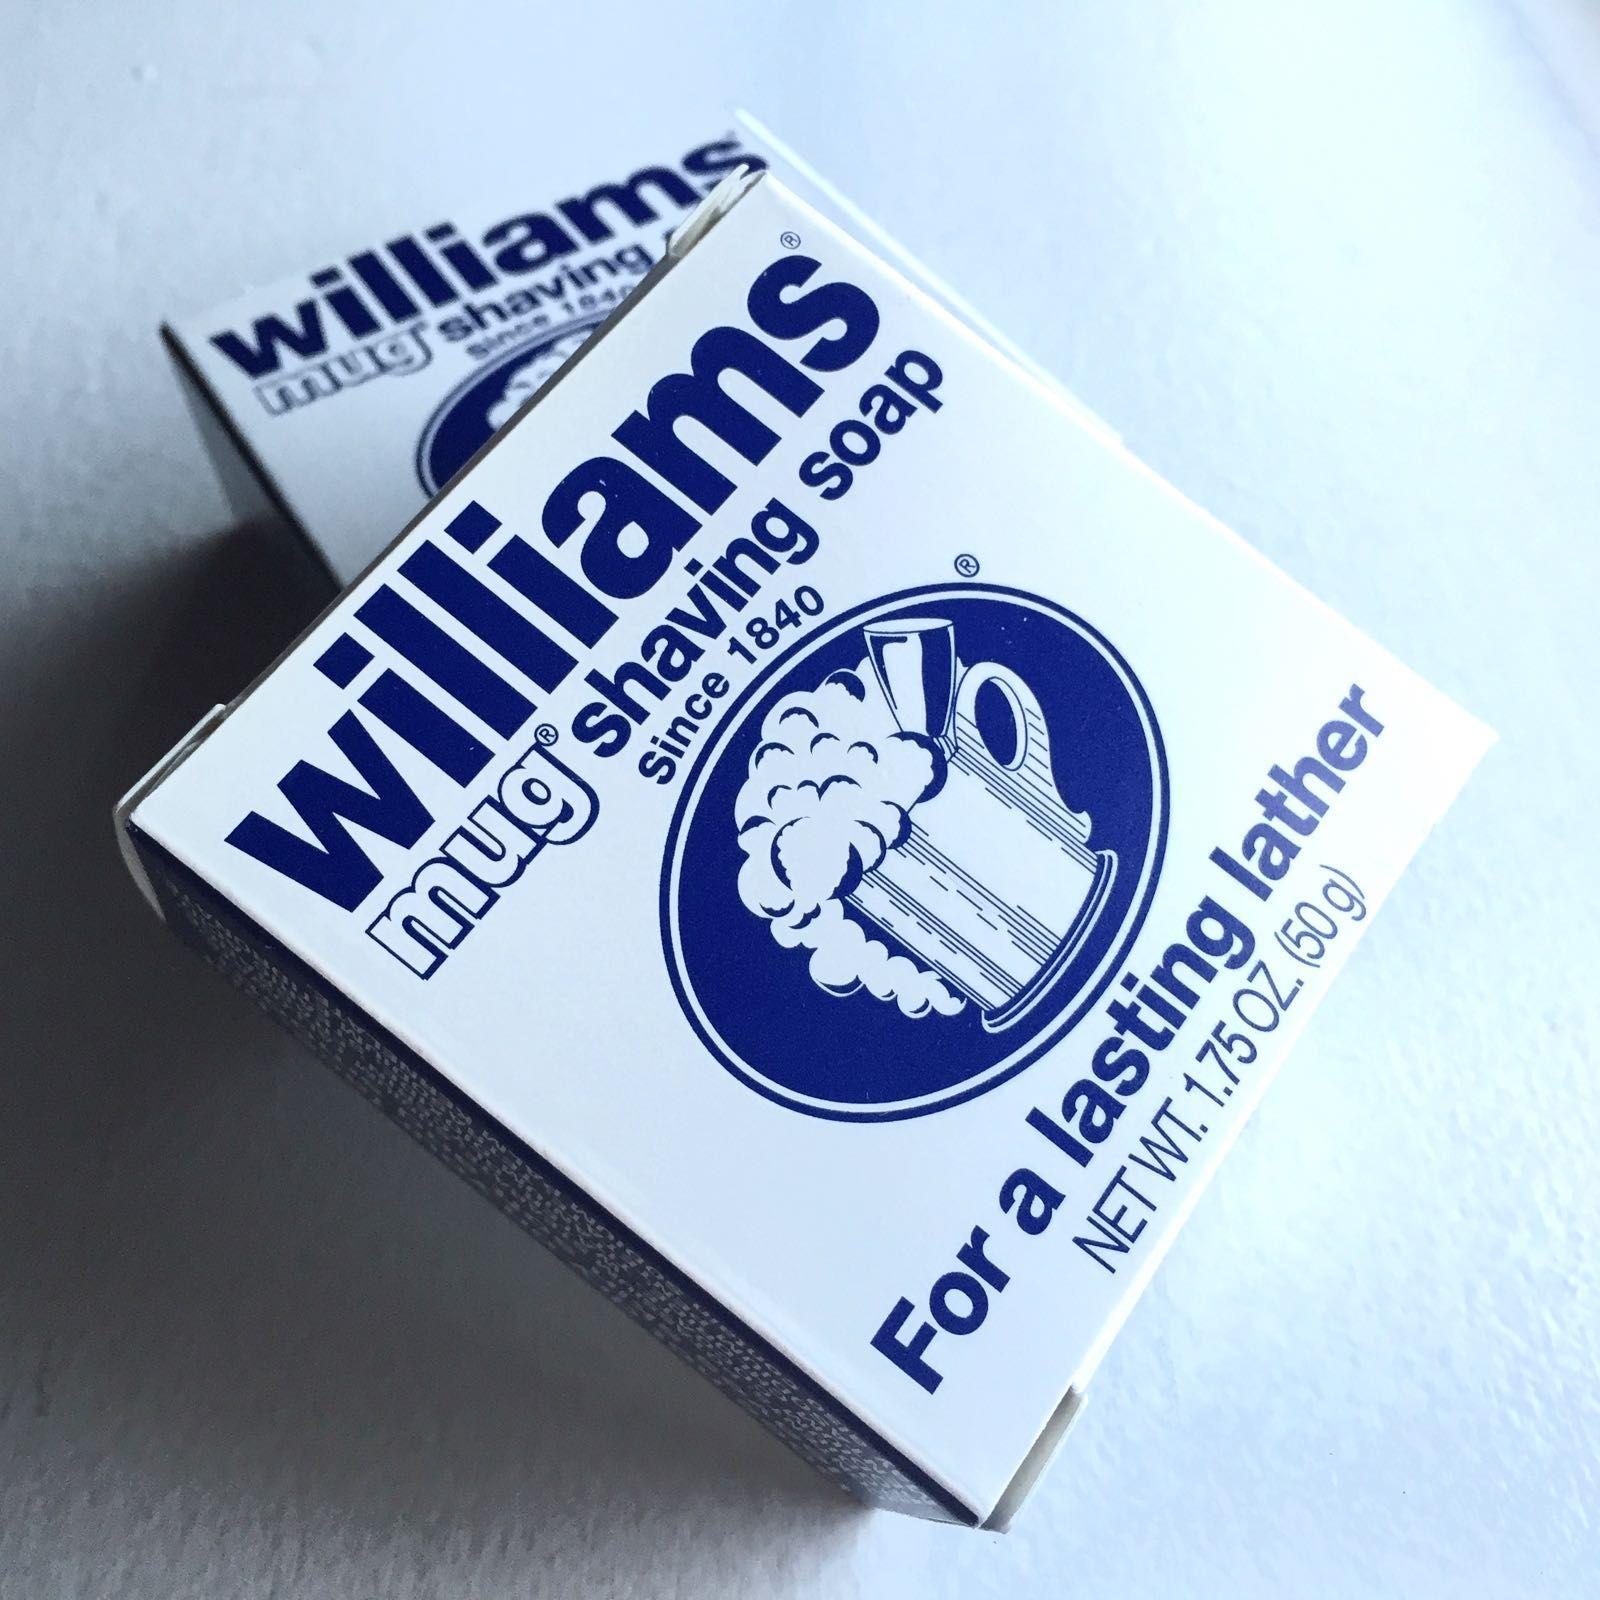 You are currently viewing Williams Mug Shaving Soap – recenzja mydła do golenia